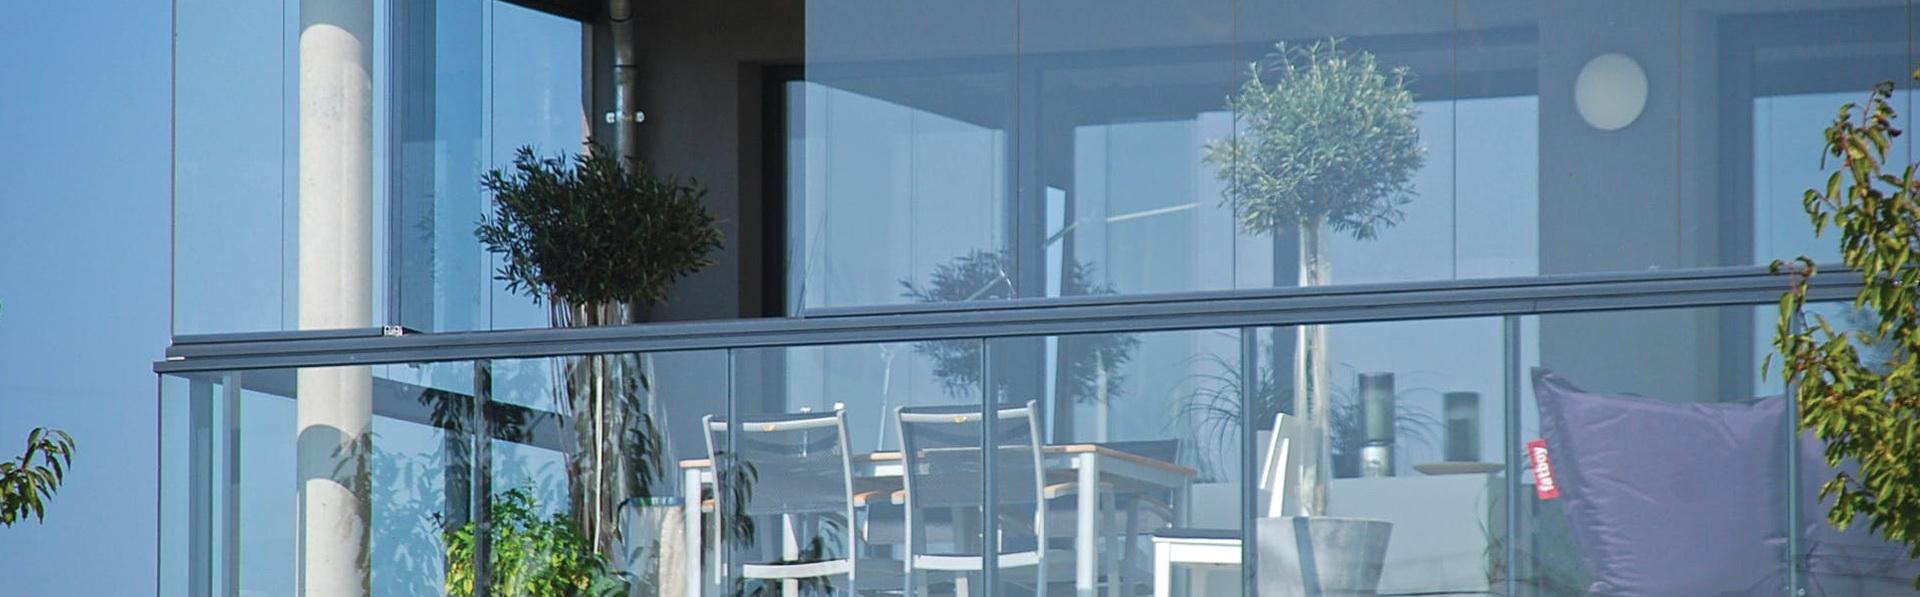 Безрамные балконы